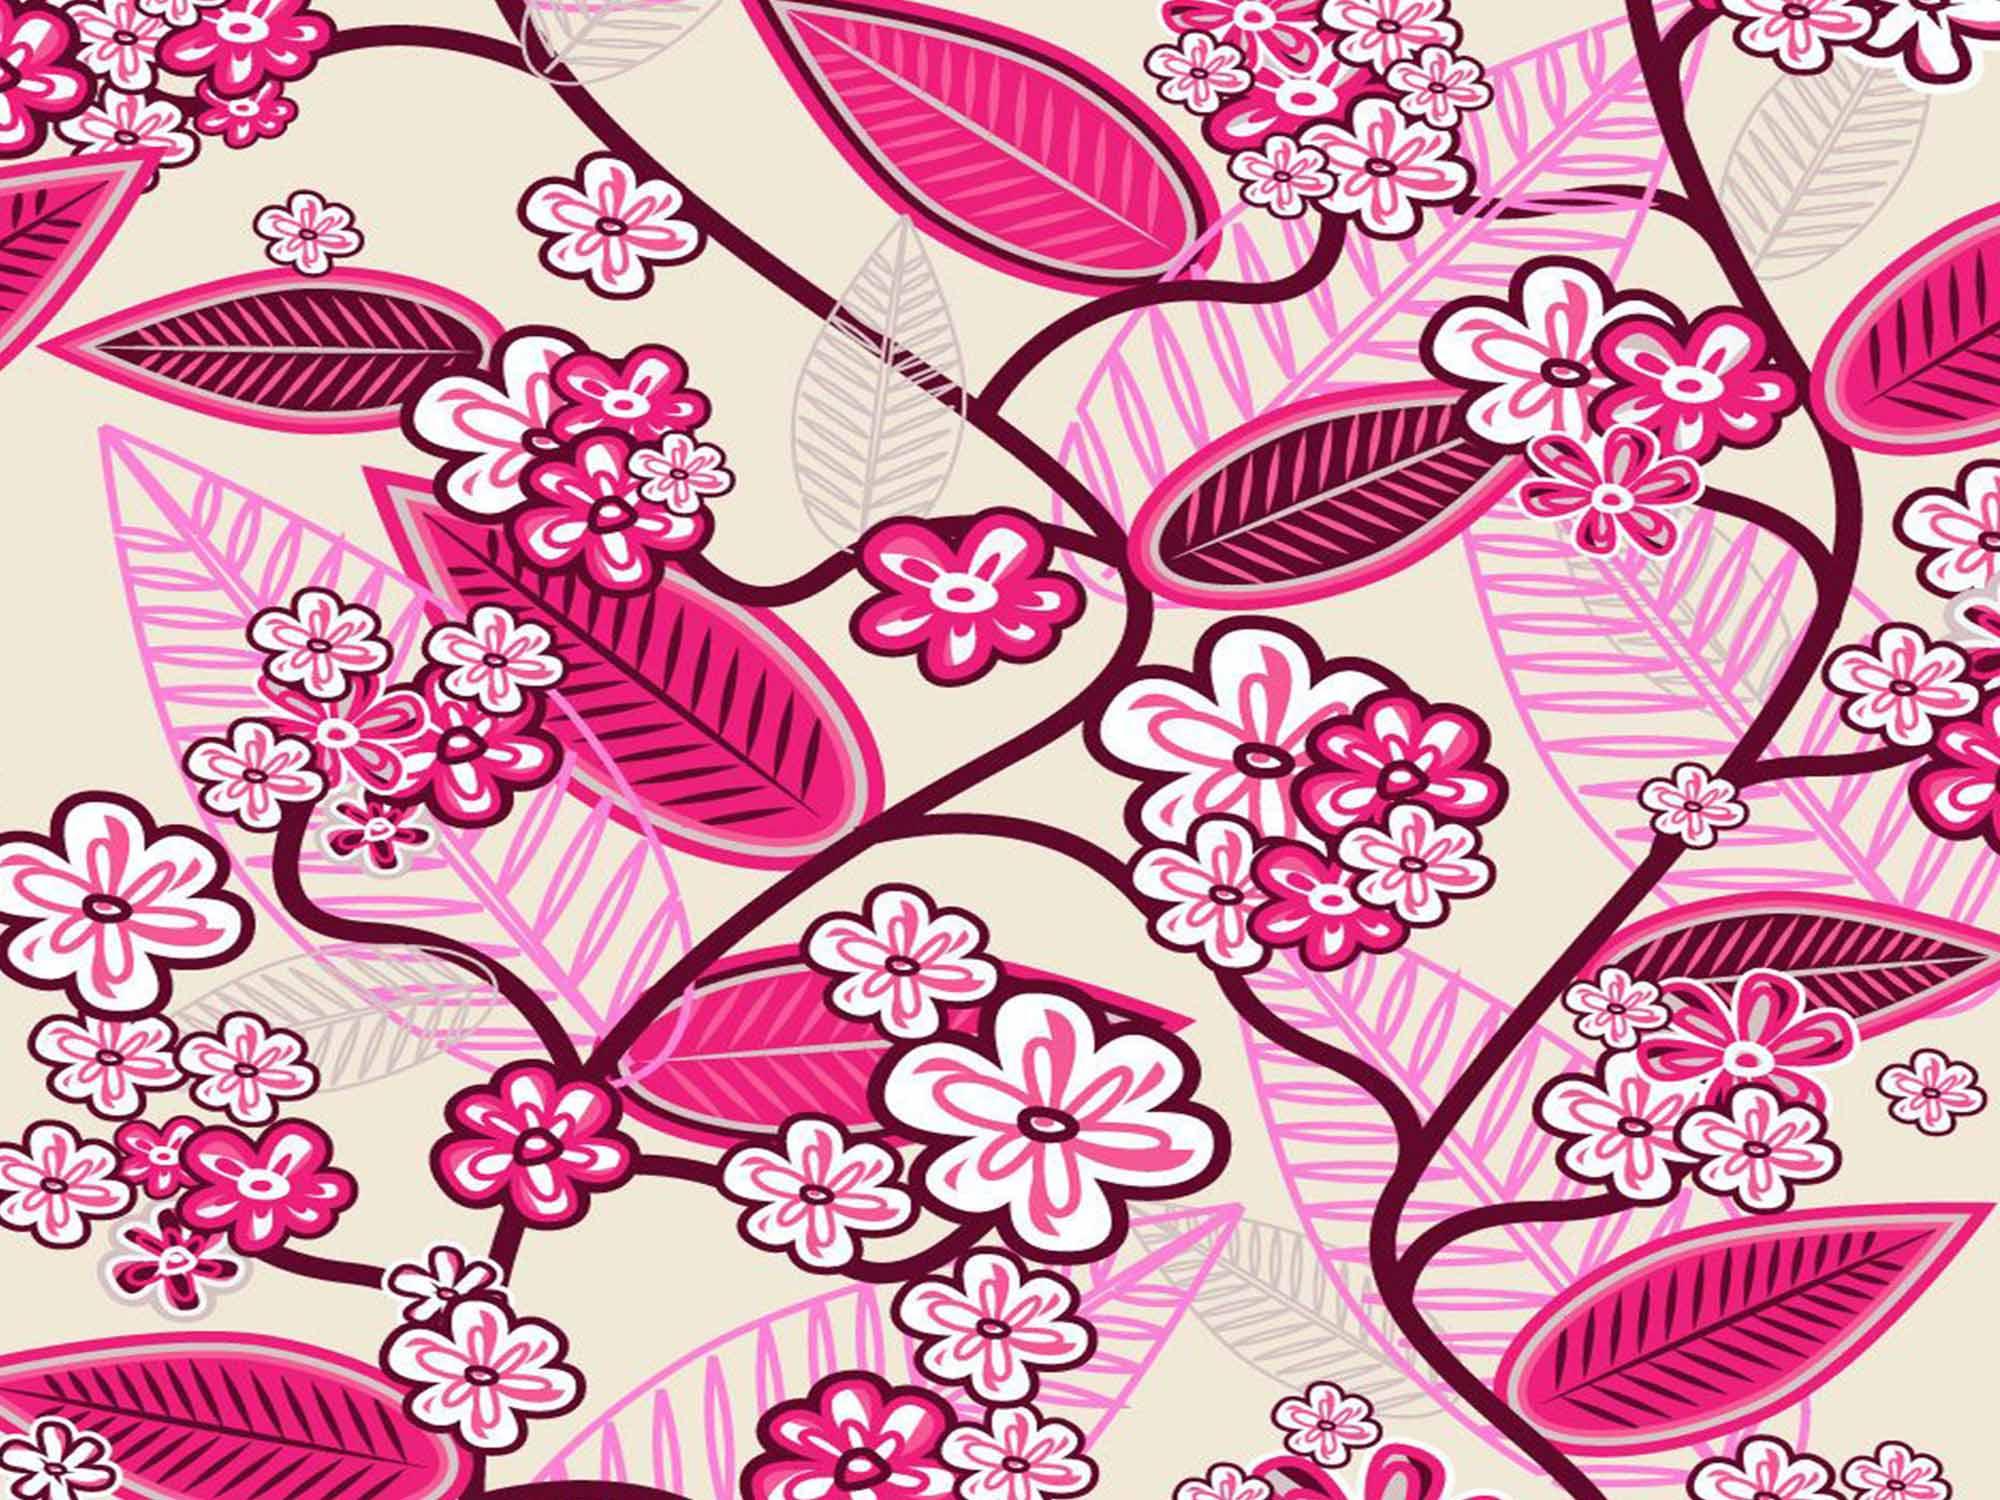 Papel de Parede Floral 0034 - Adesivos de Parede  - Paredes Decoradas